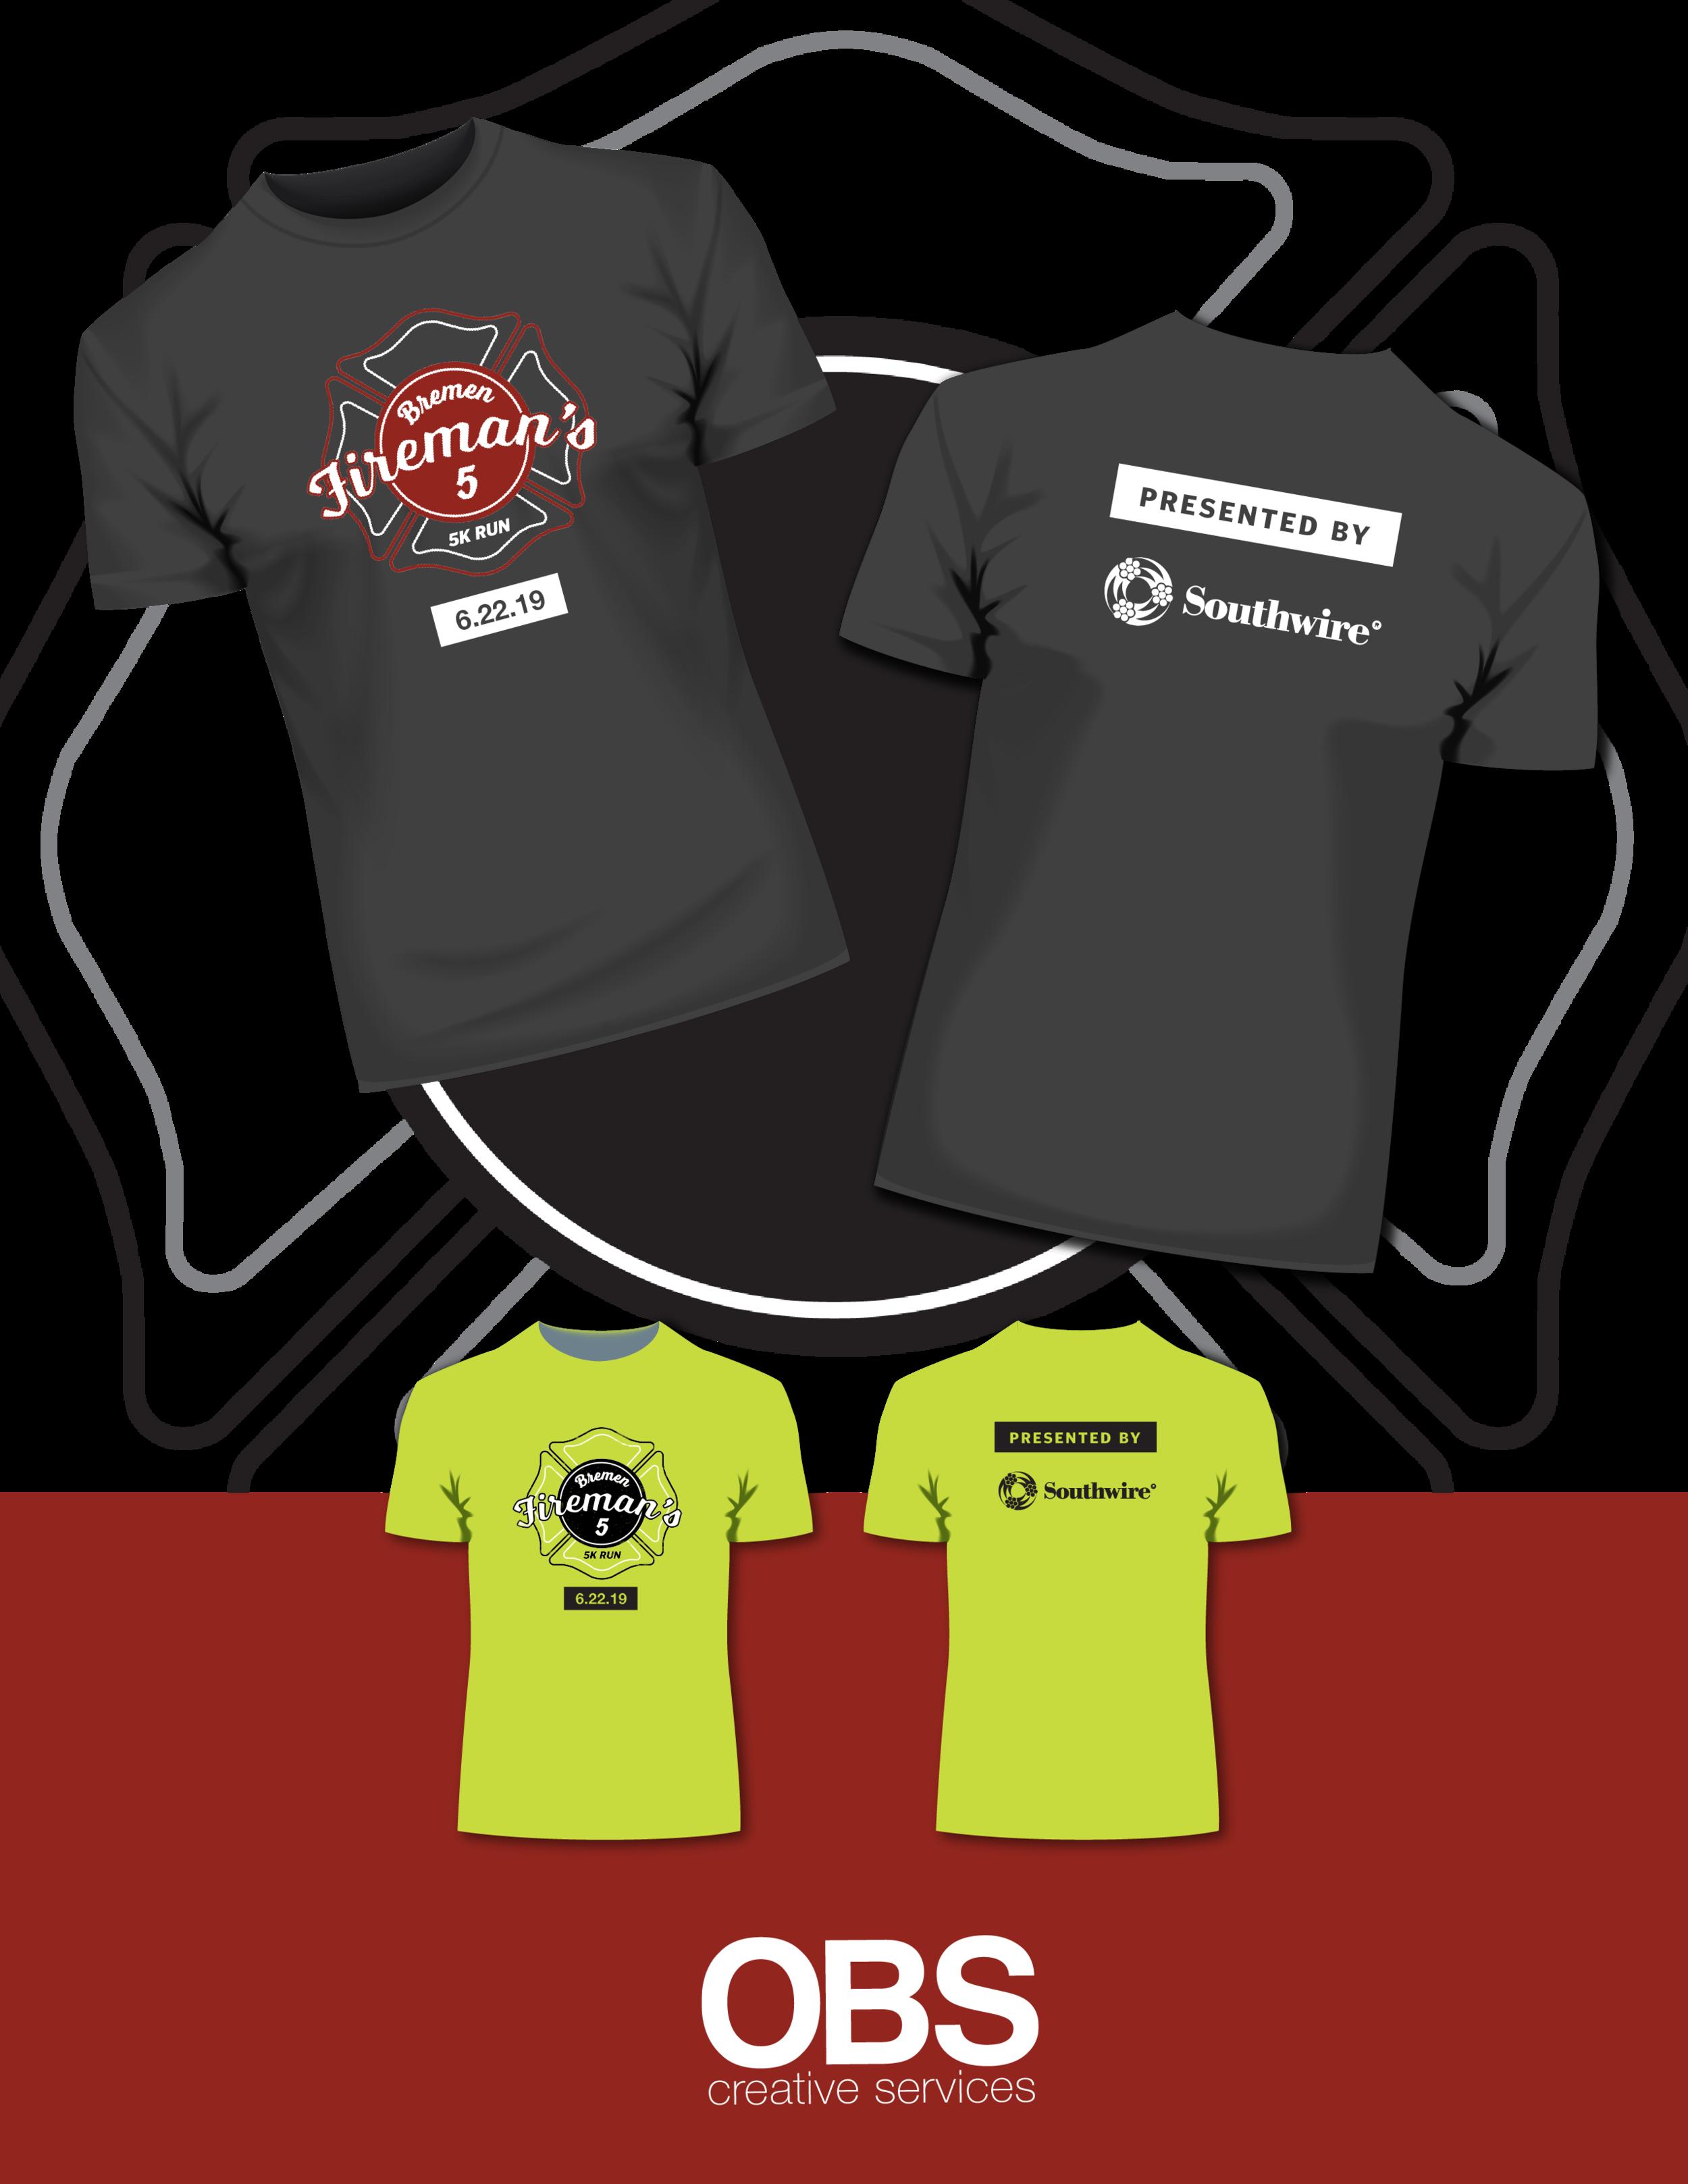 Bremen 5k T-Shirt Design.png